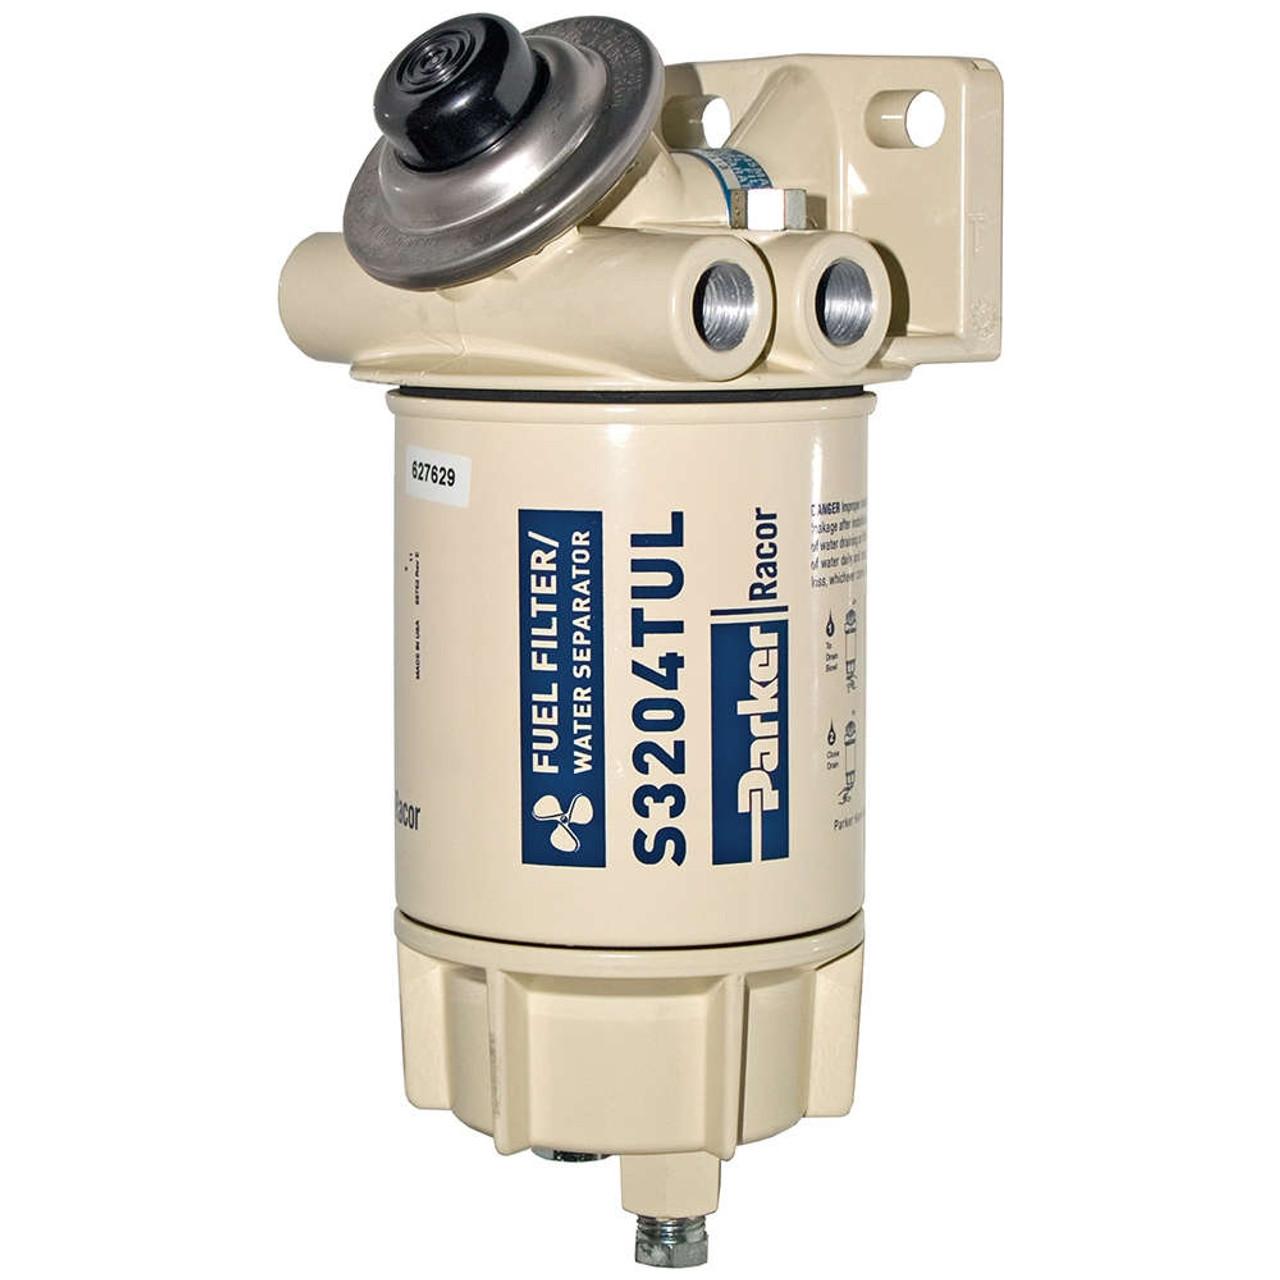 medium resolution of racor aquabloc marine 3 8 in 45 gph spin on diesel fuel filter mix racor aquabloc